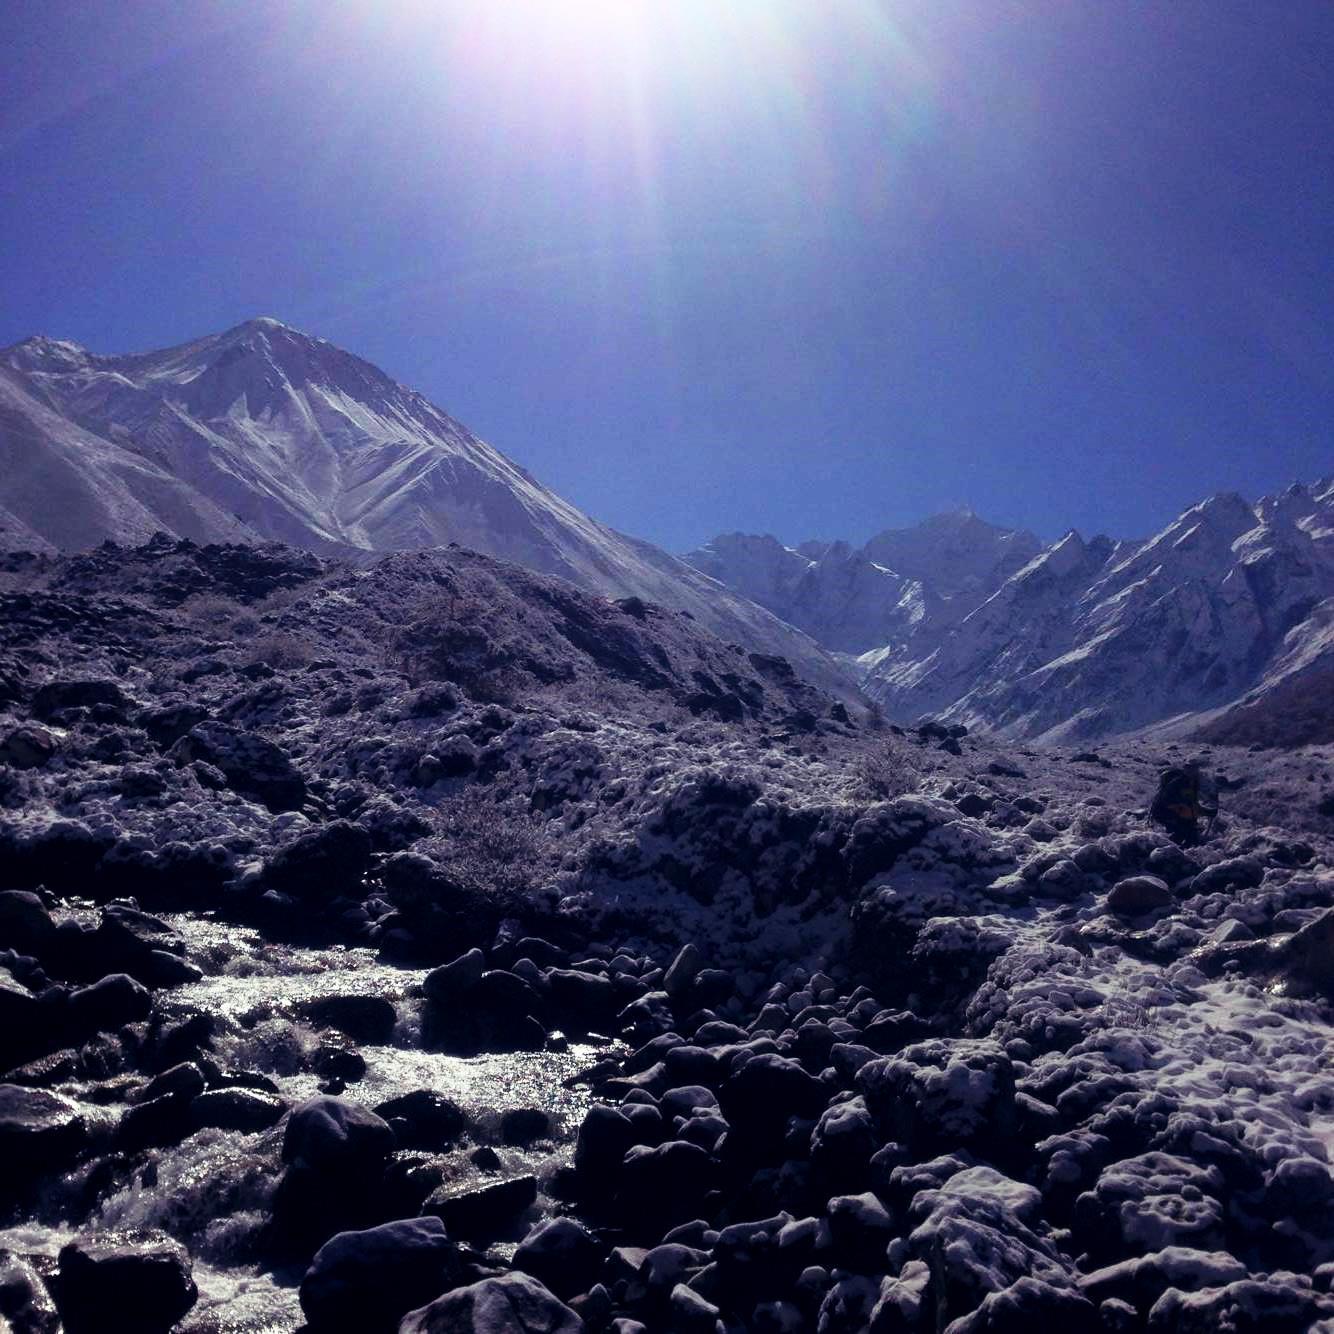 The sun is shining - Langtang Valley Trek